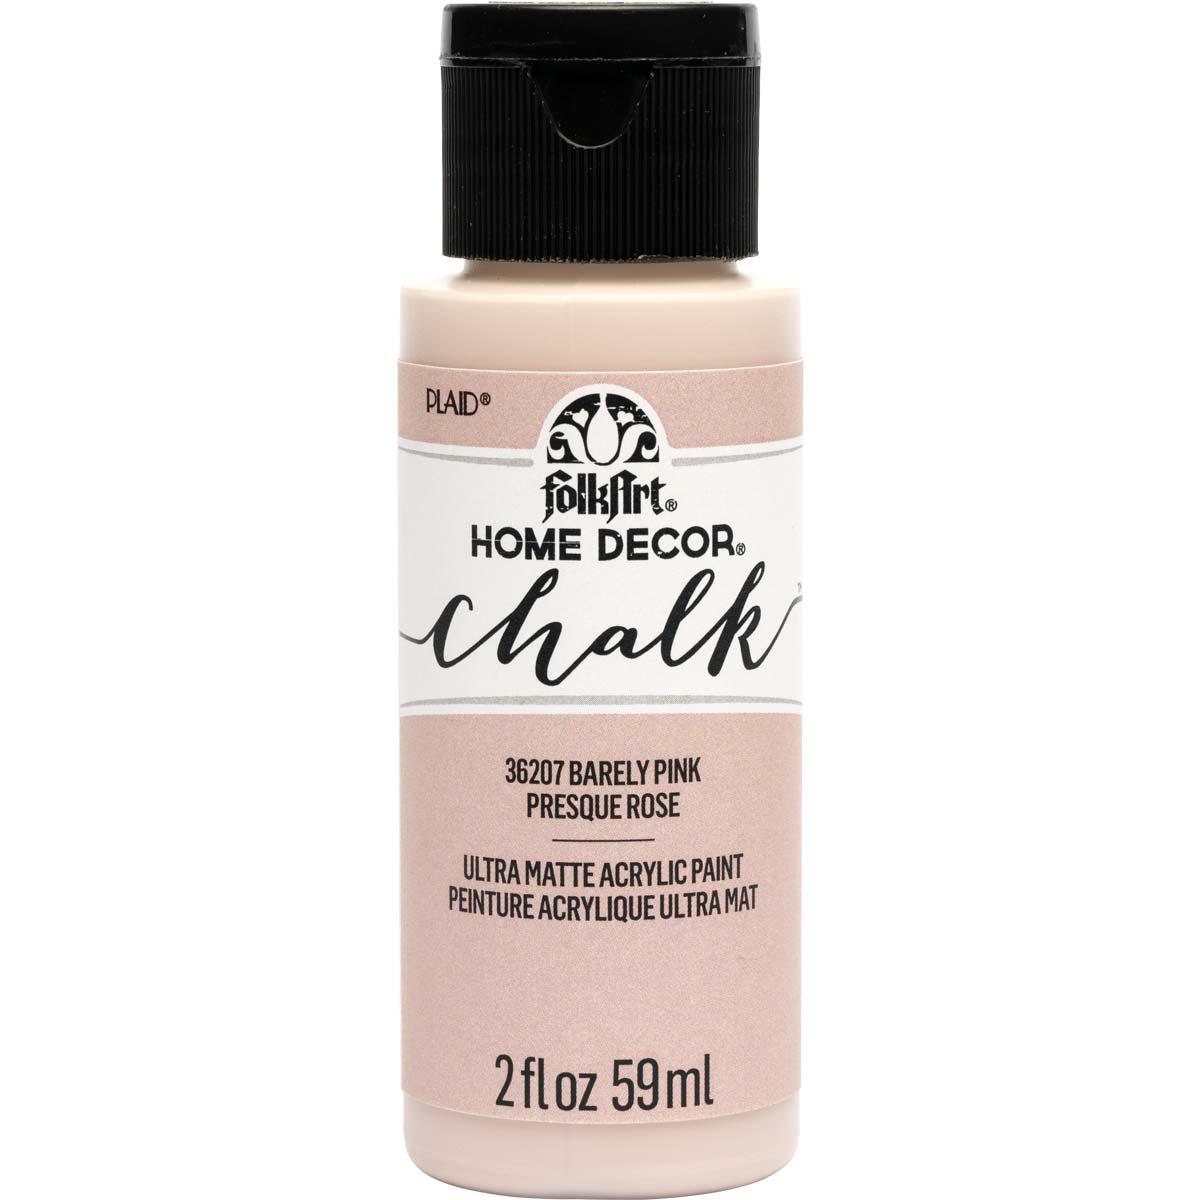 FolkArt Home Decor Chalk - Barely Pink, 2 oz. - 36207